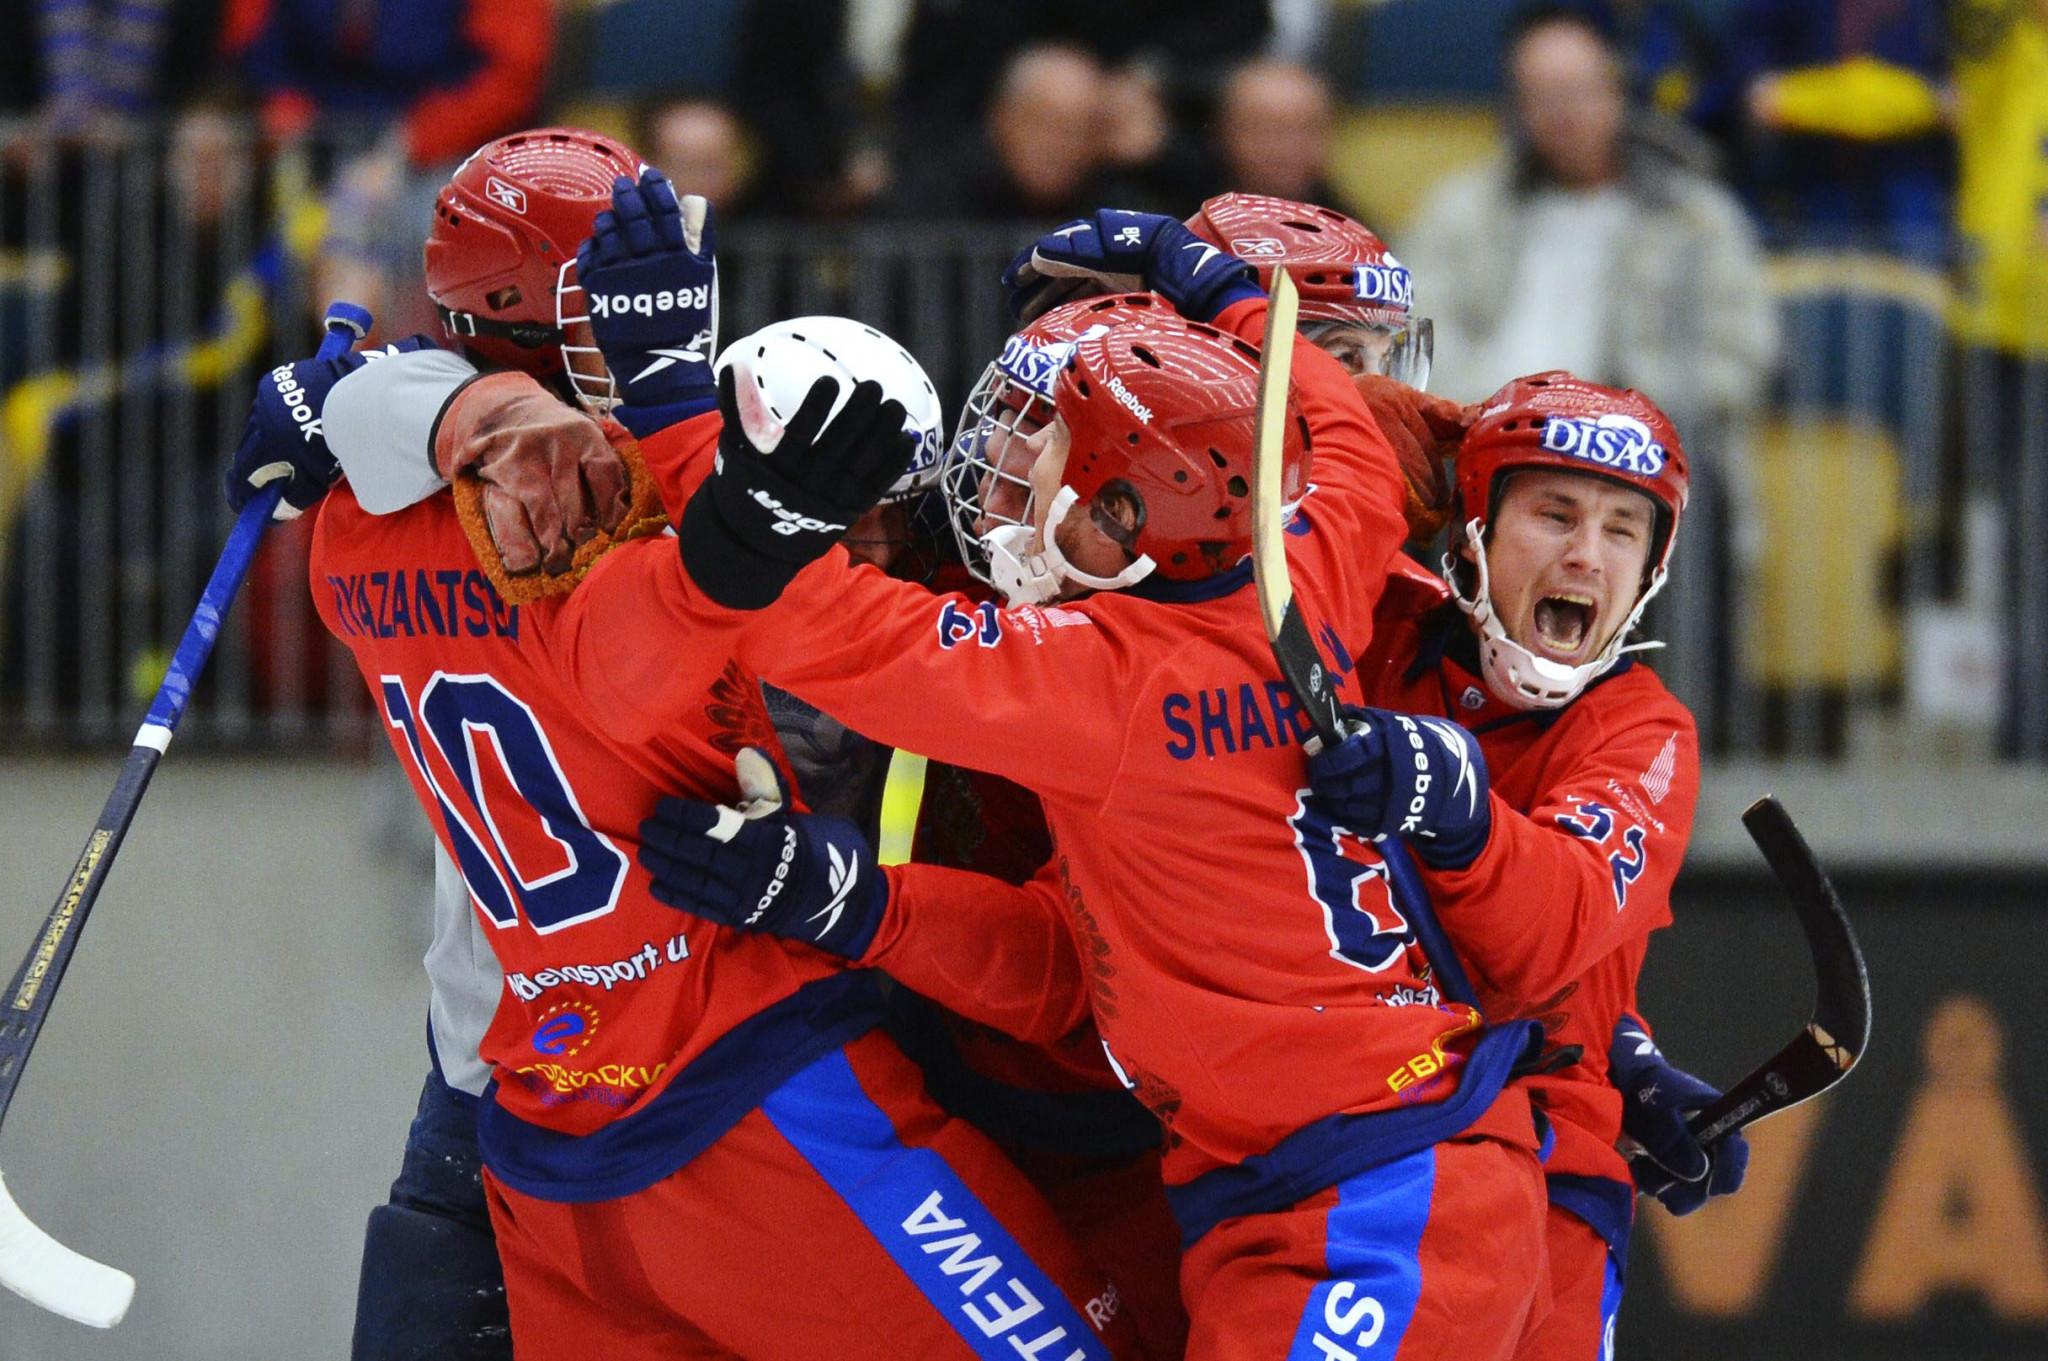 Russia's six-time bandy world champion Ishkeldin dies age 30